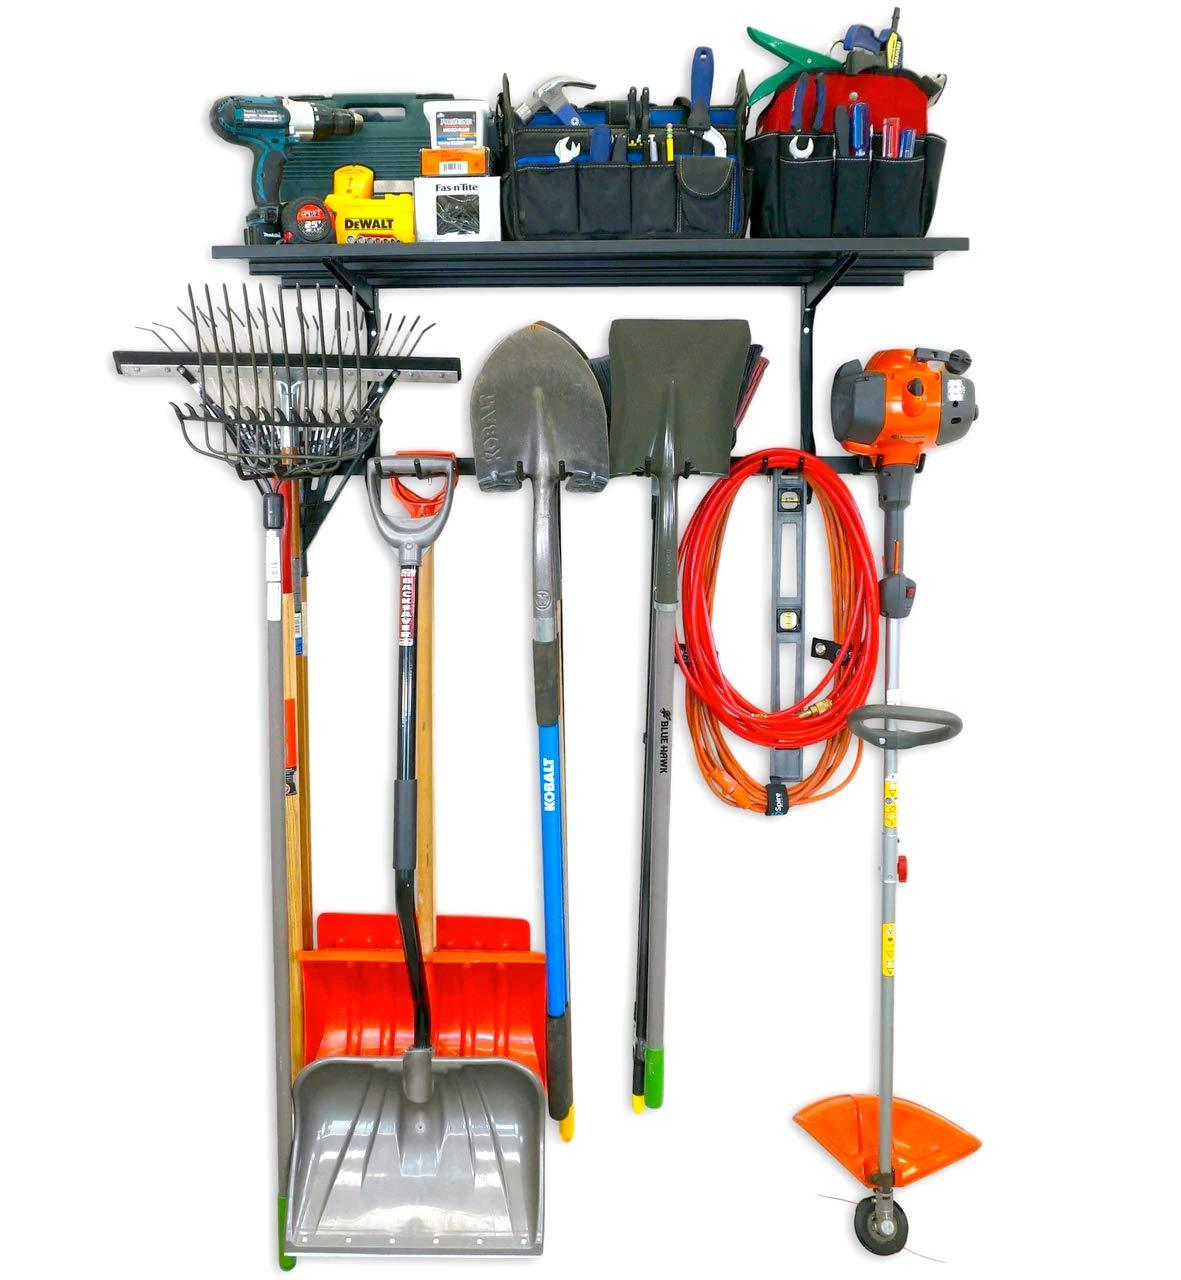 StoreYourBoard Omni Tool Rack and Storage Shelf, Home and Garage Organizer, Adjustable Wall Hanger System